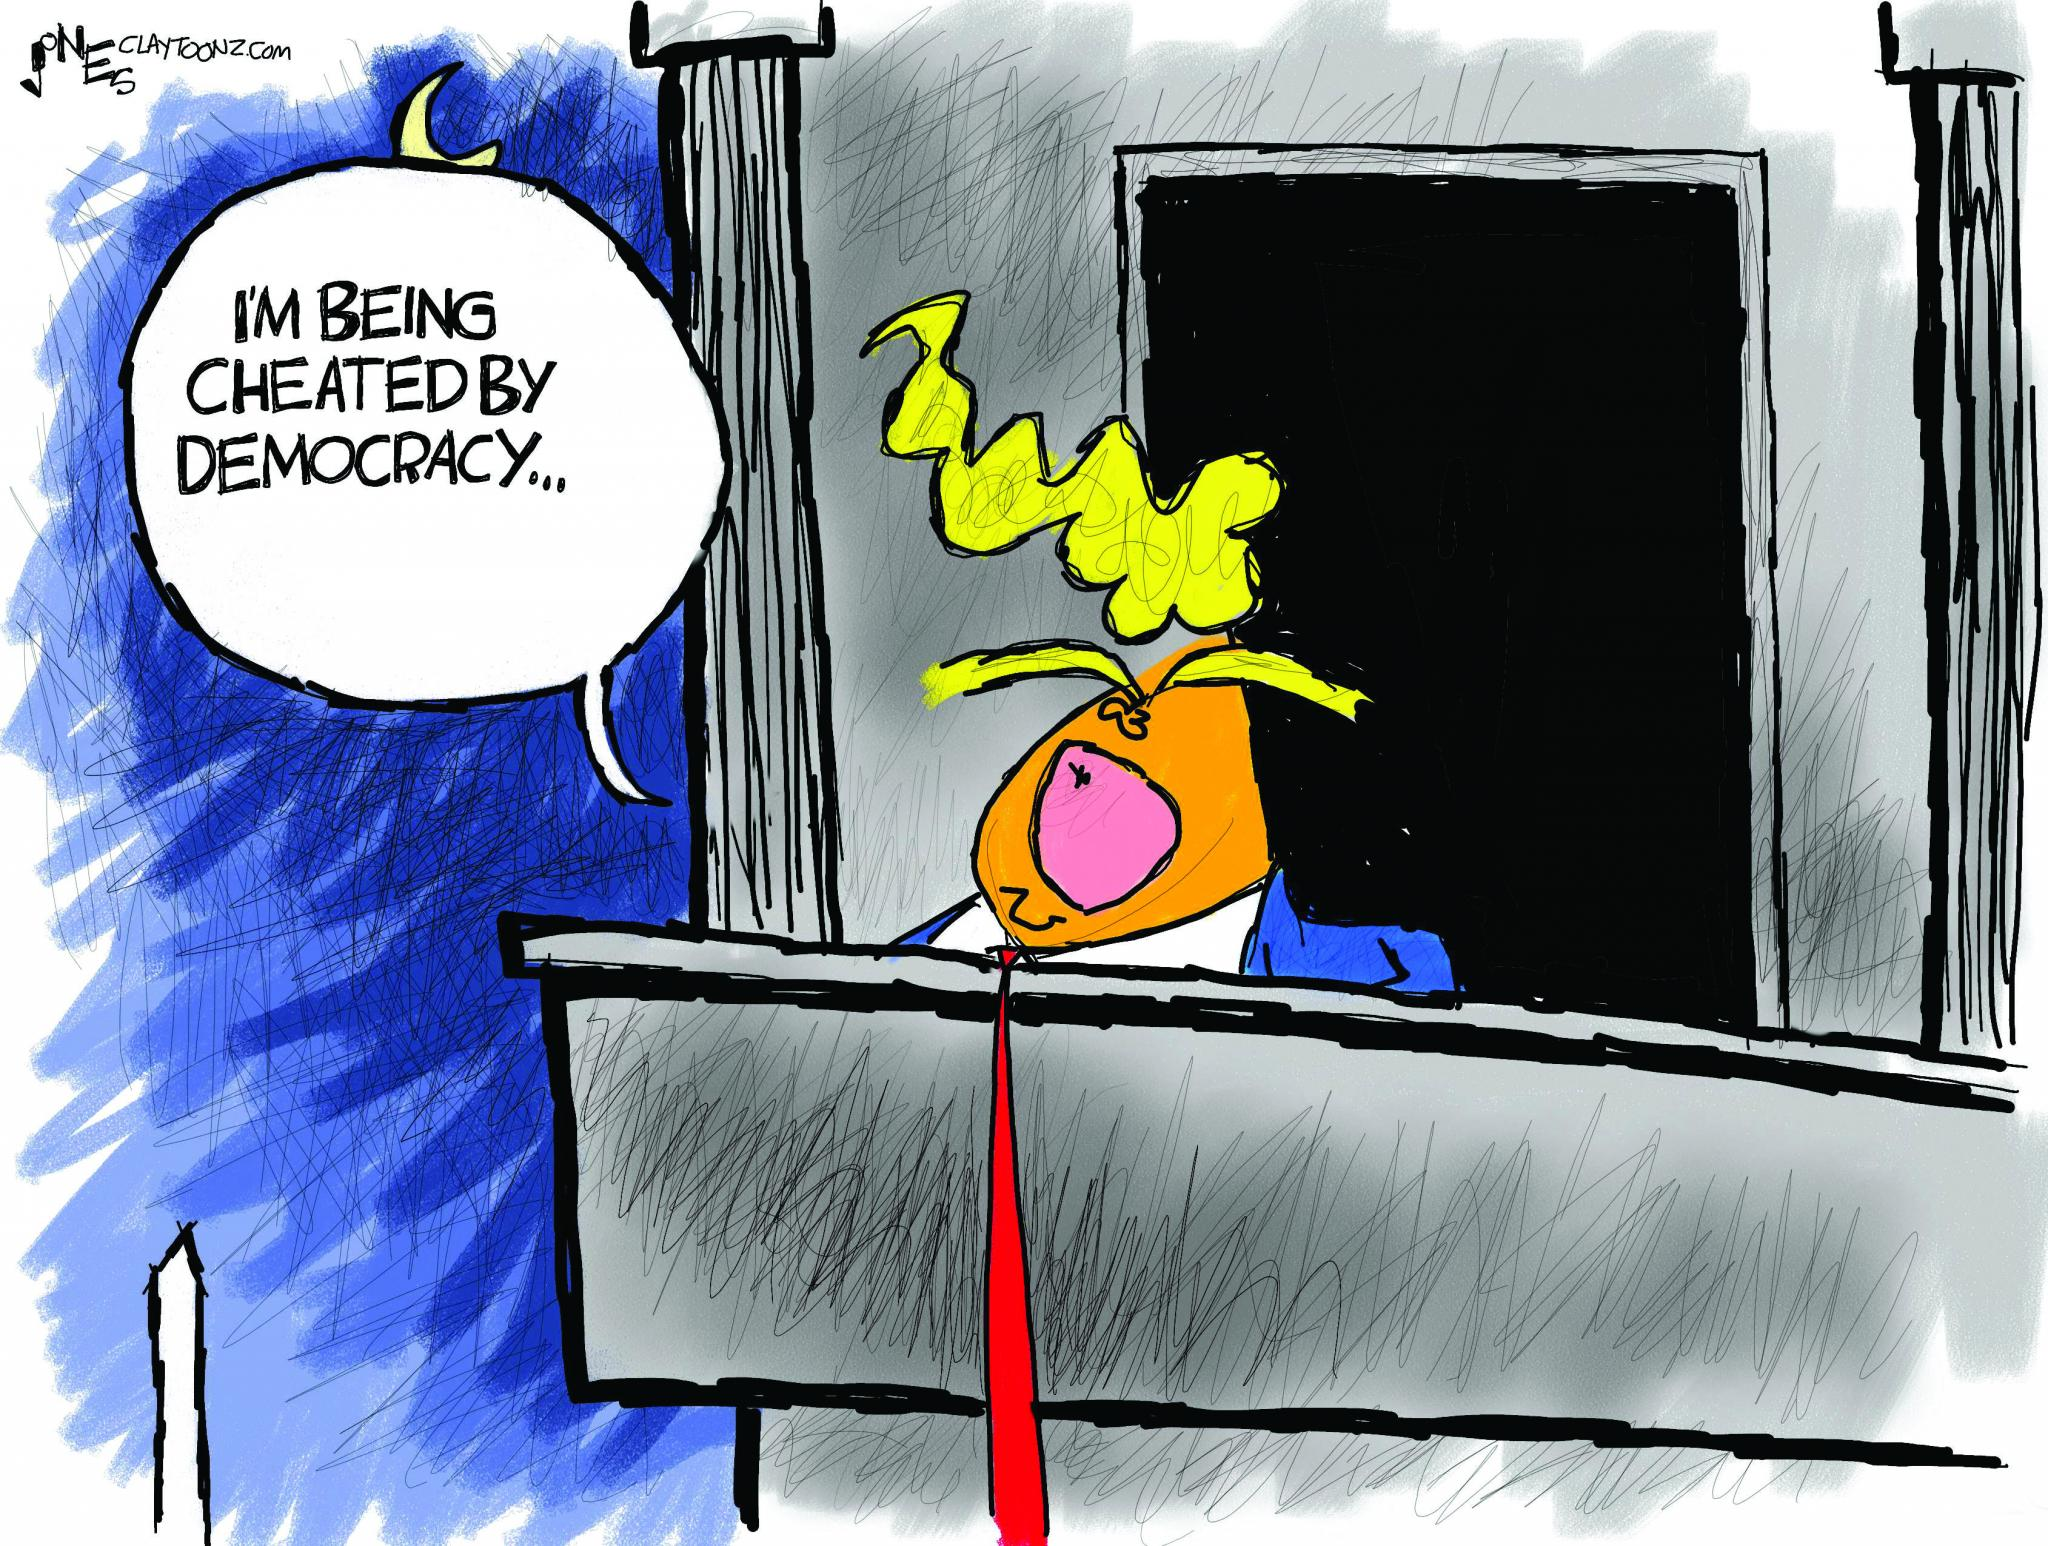 Political cartoons - the 'funny' pics thread.-cjones11092020-jpg